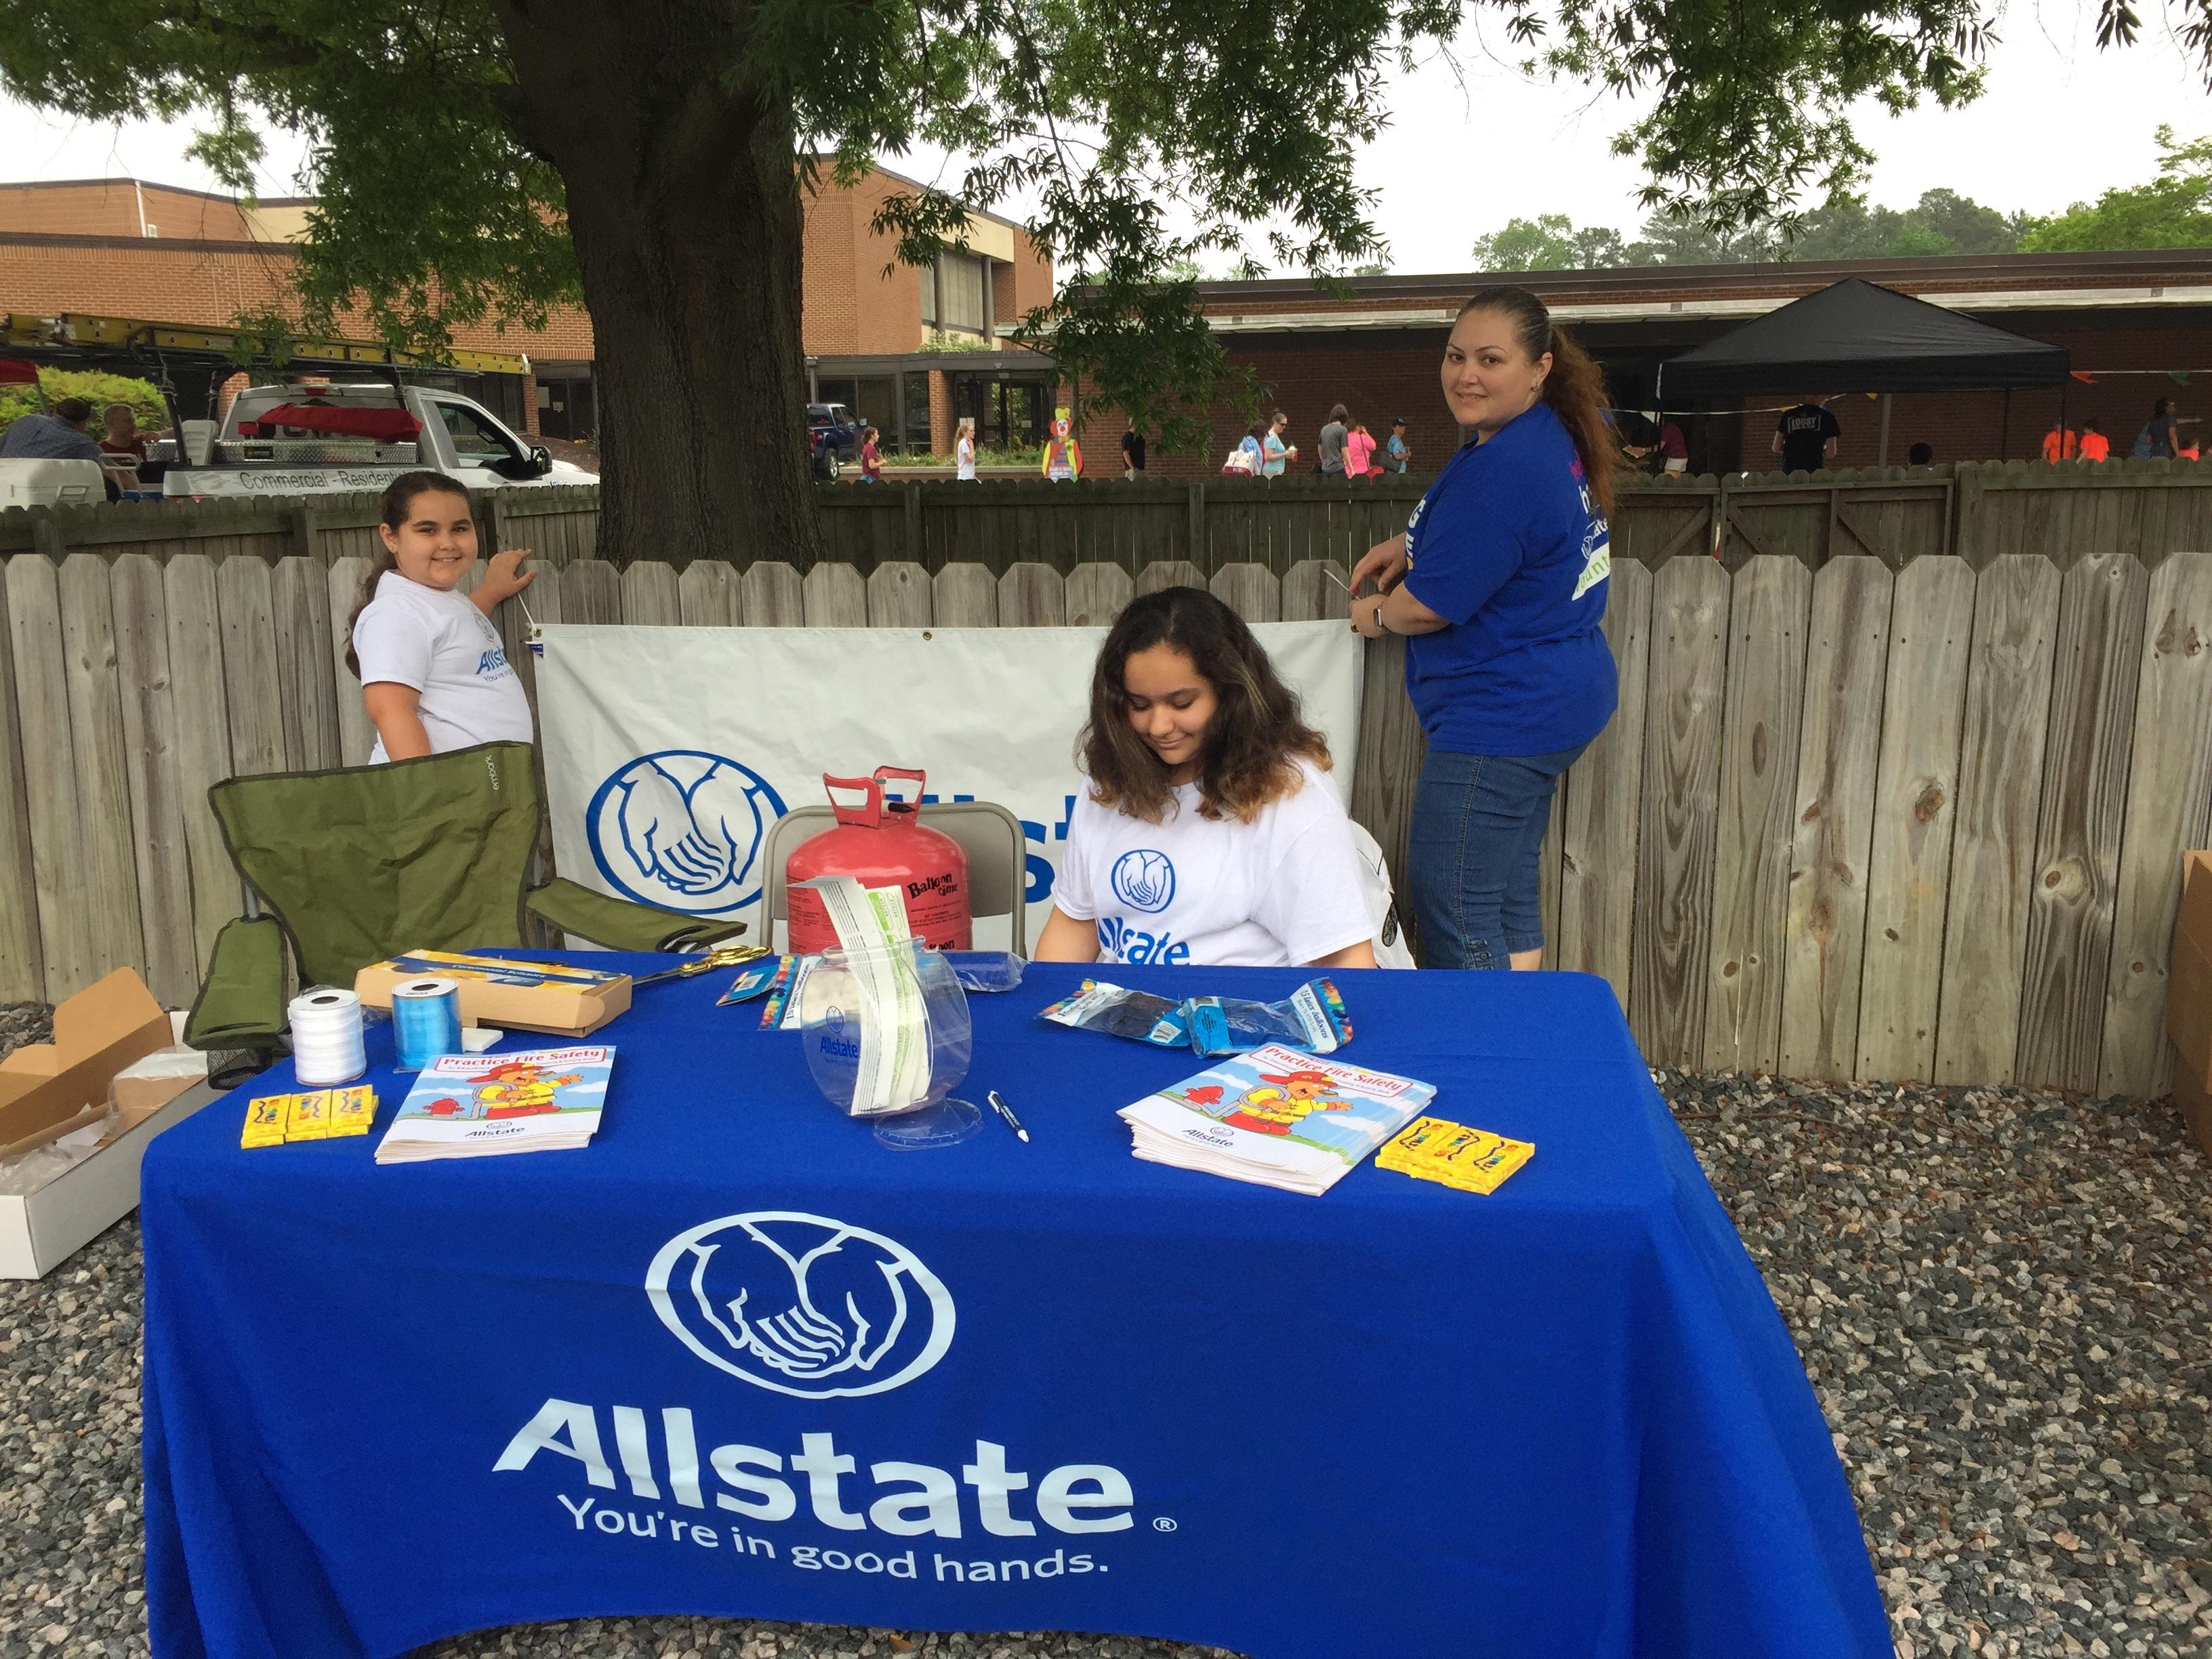 Steven Rivera: Allstate Insurance image 4